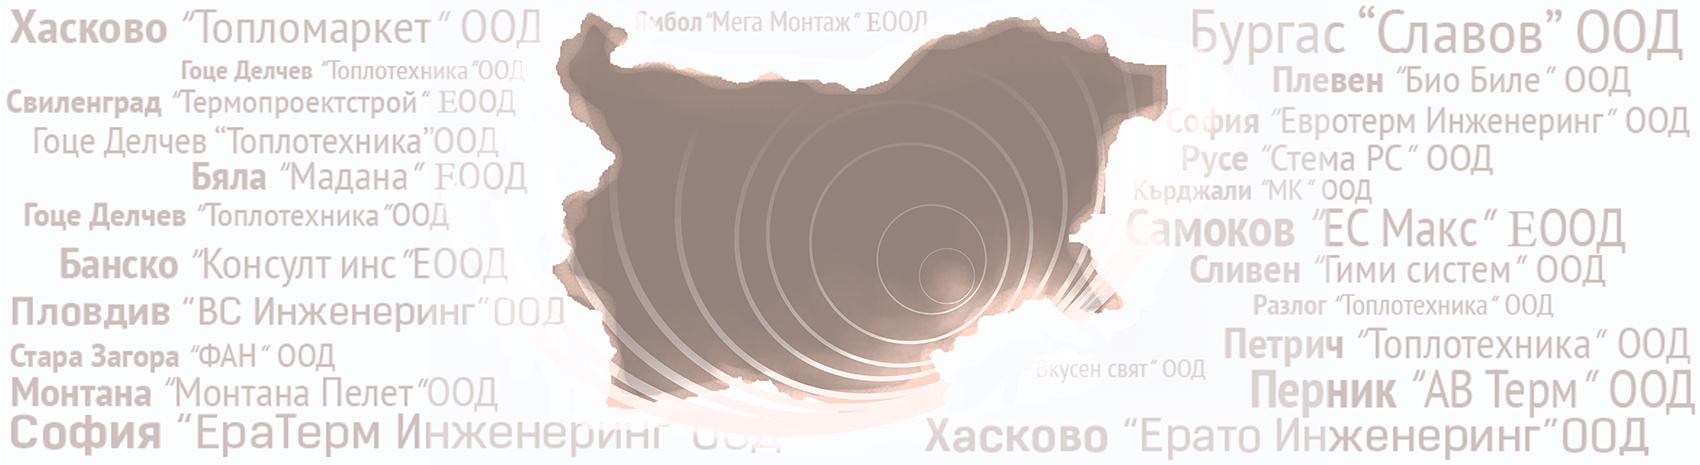 MAP DISTRIBUTION 2018 small